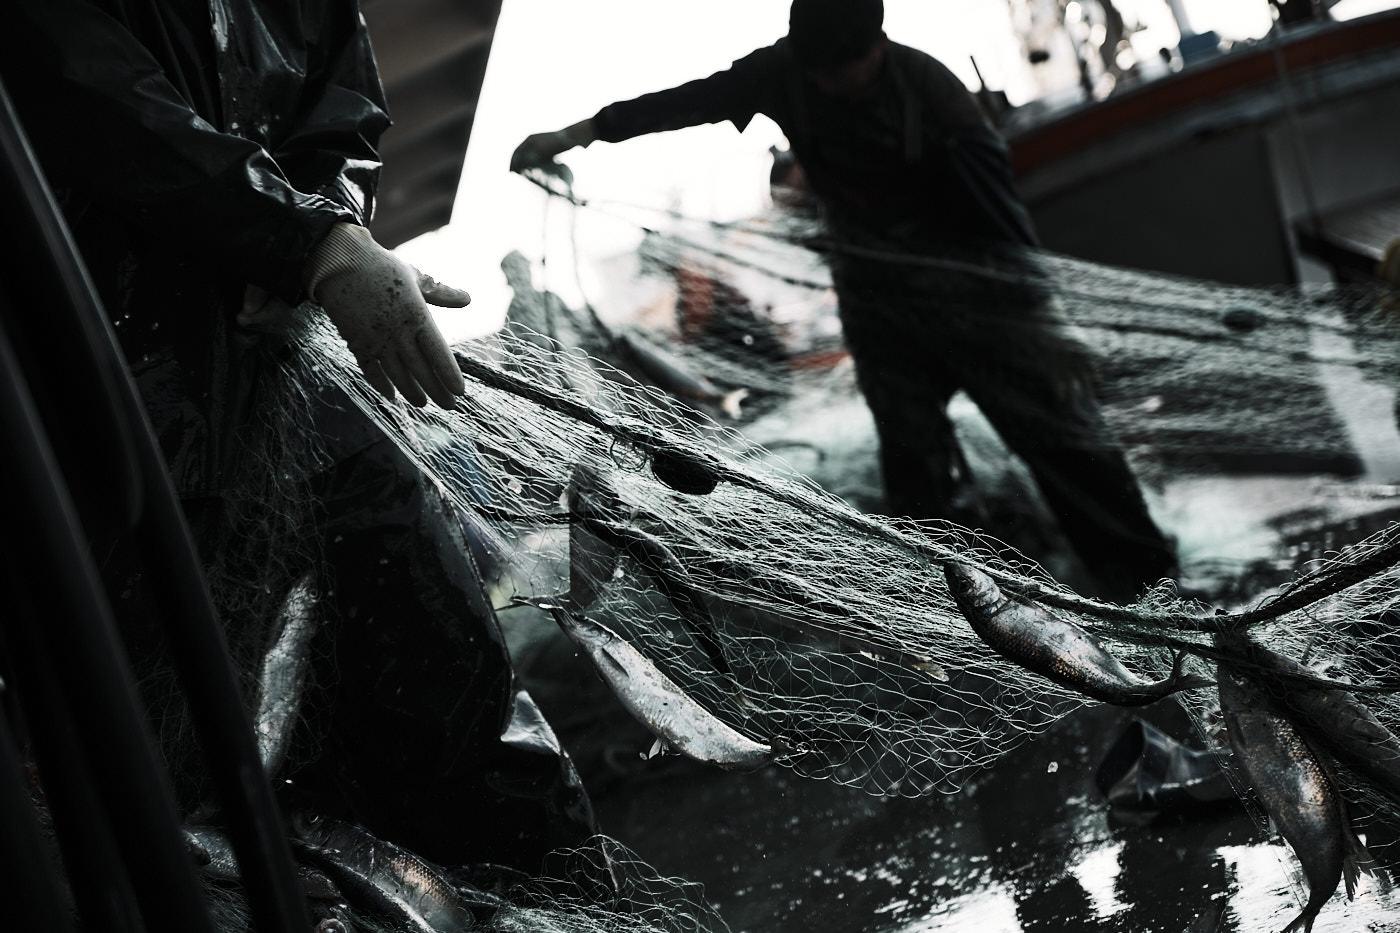 Fishermen - Samcheok, South Korea